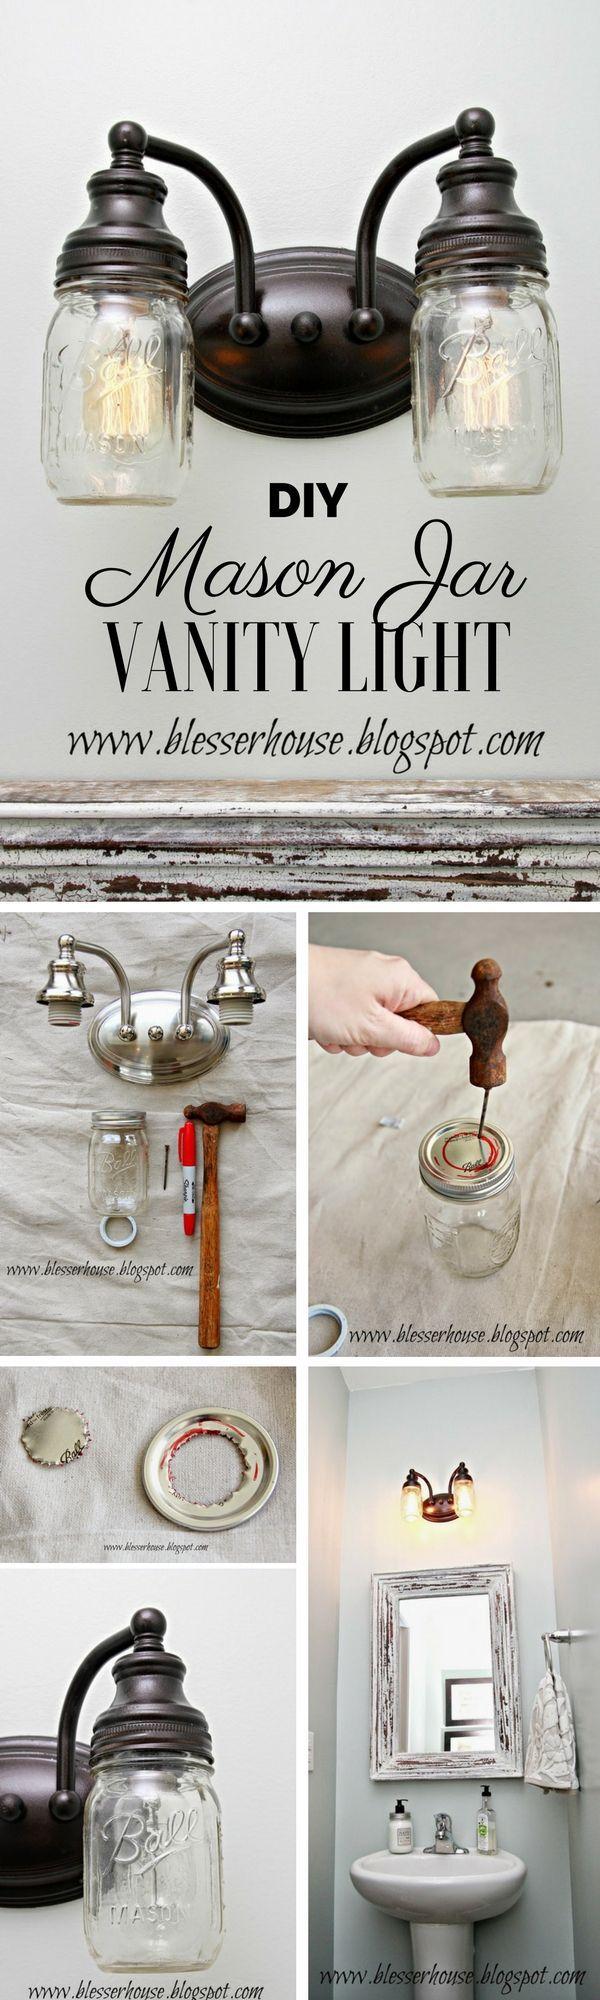 Check out the tutorial: #DIY Mason Jar Vanity Light @istandarddesign